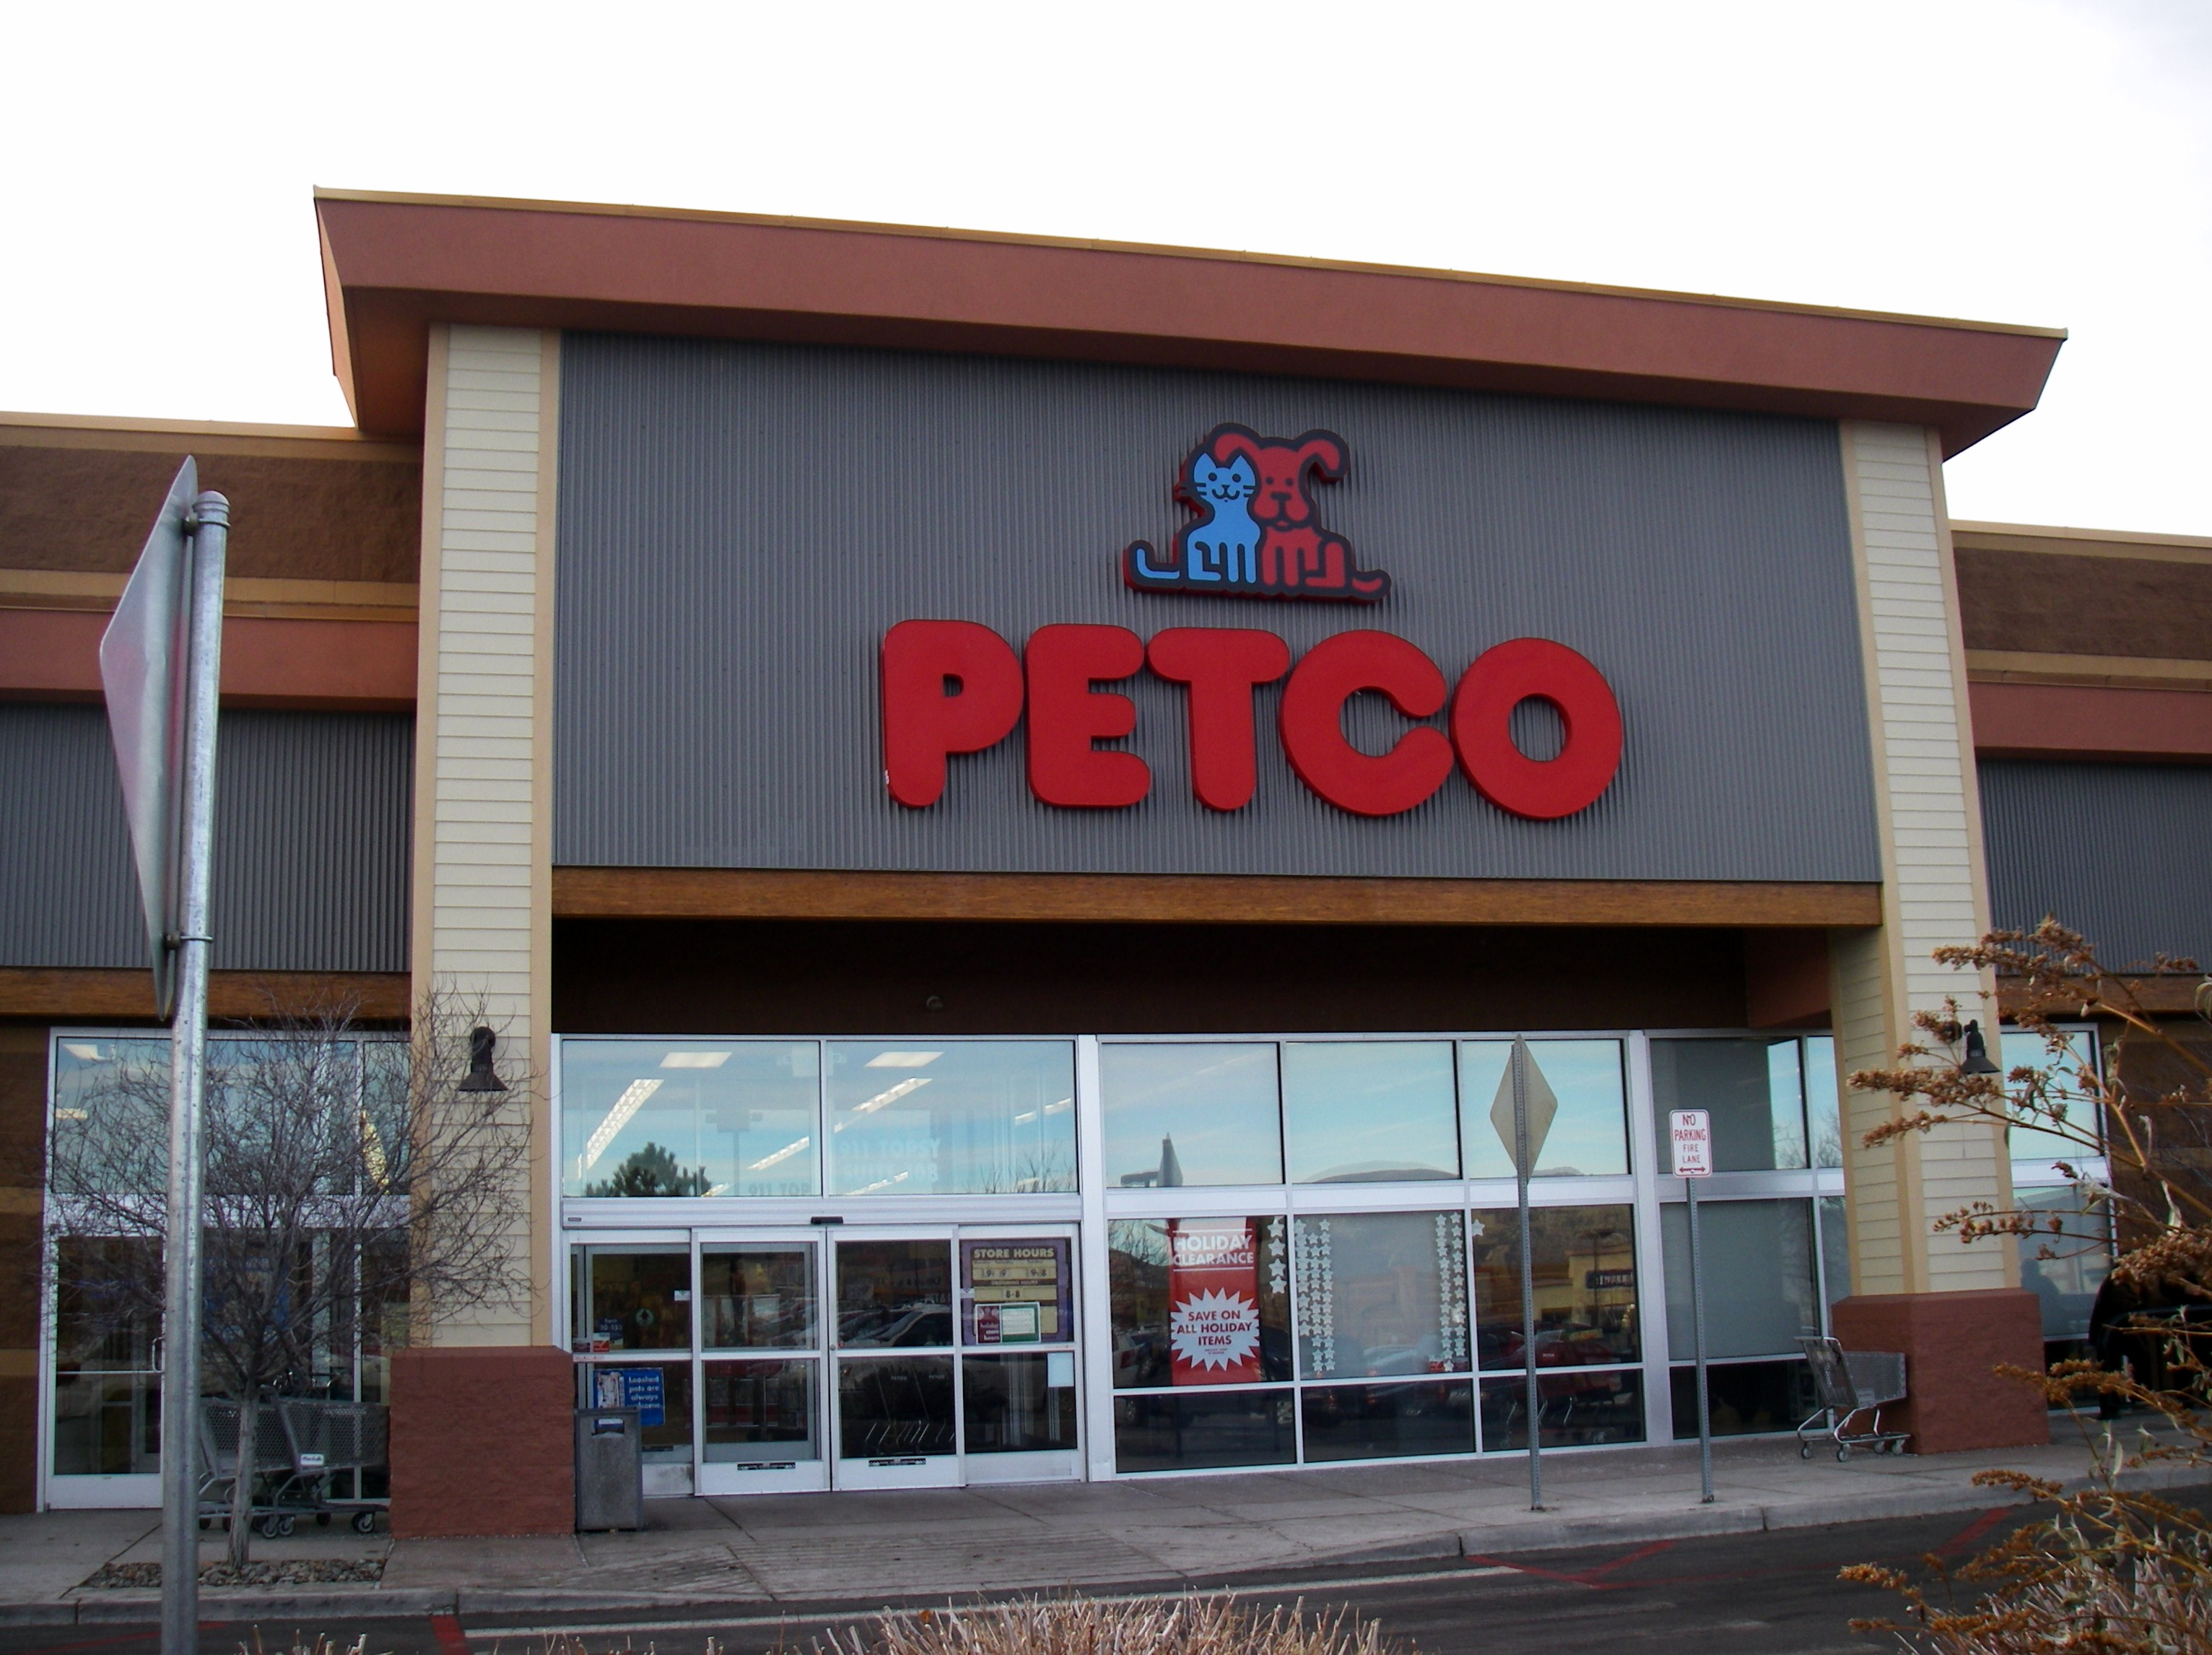 Petco - Carson City, NV